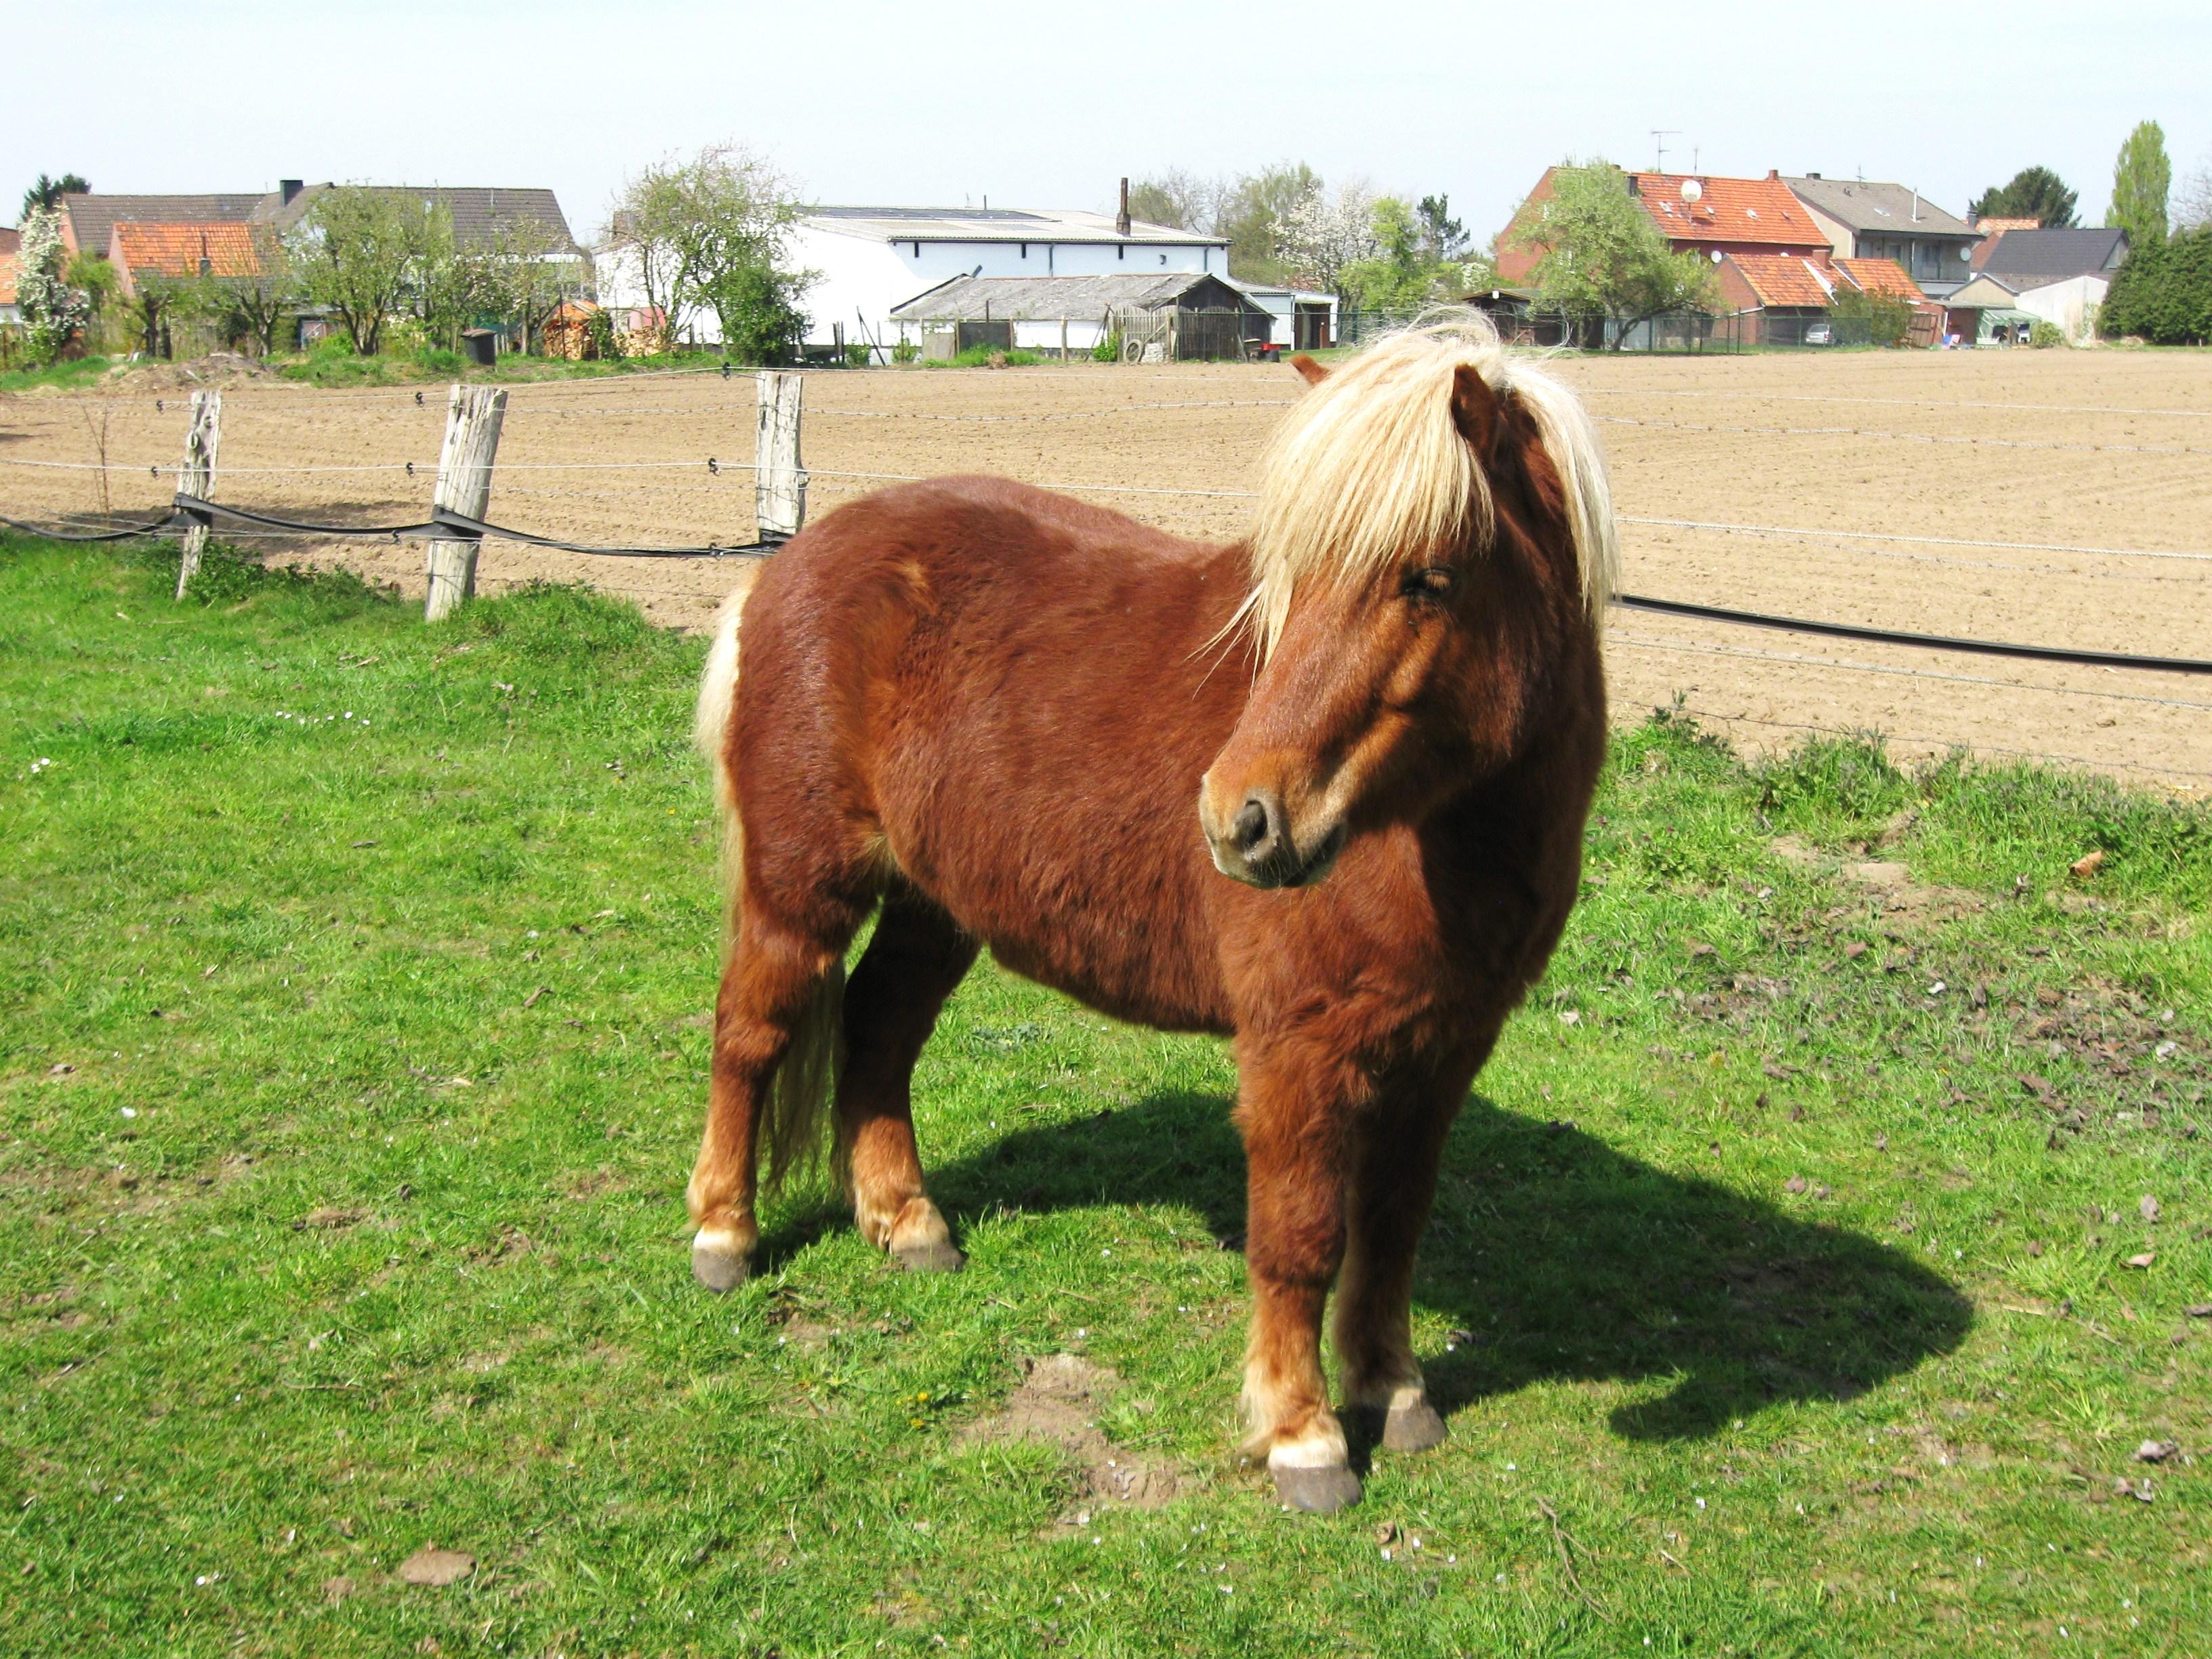 A cross-bred Shetland pony